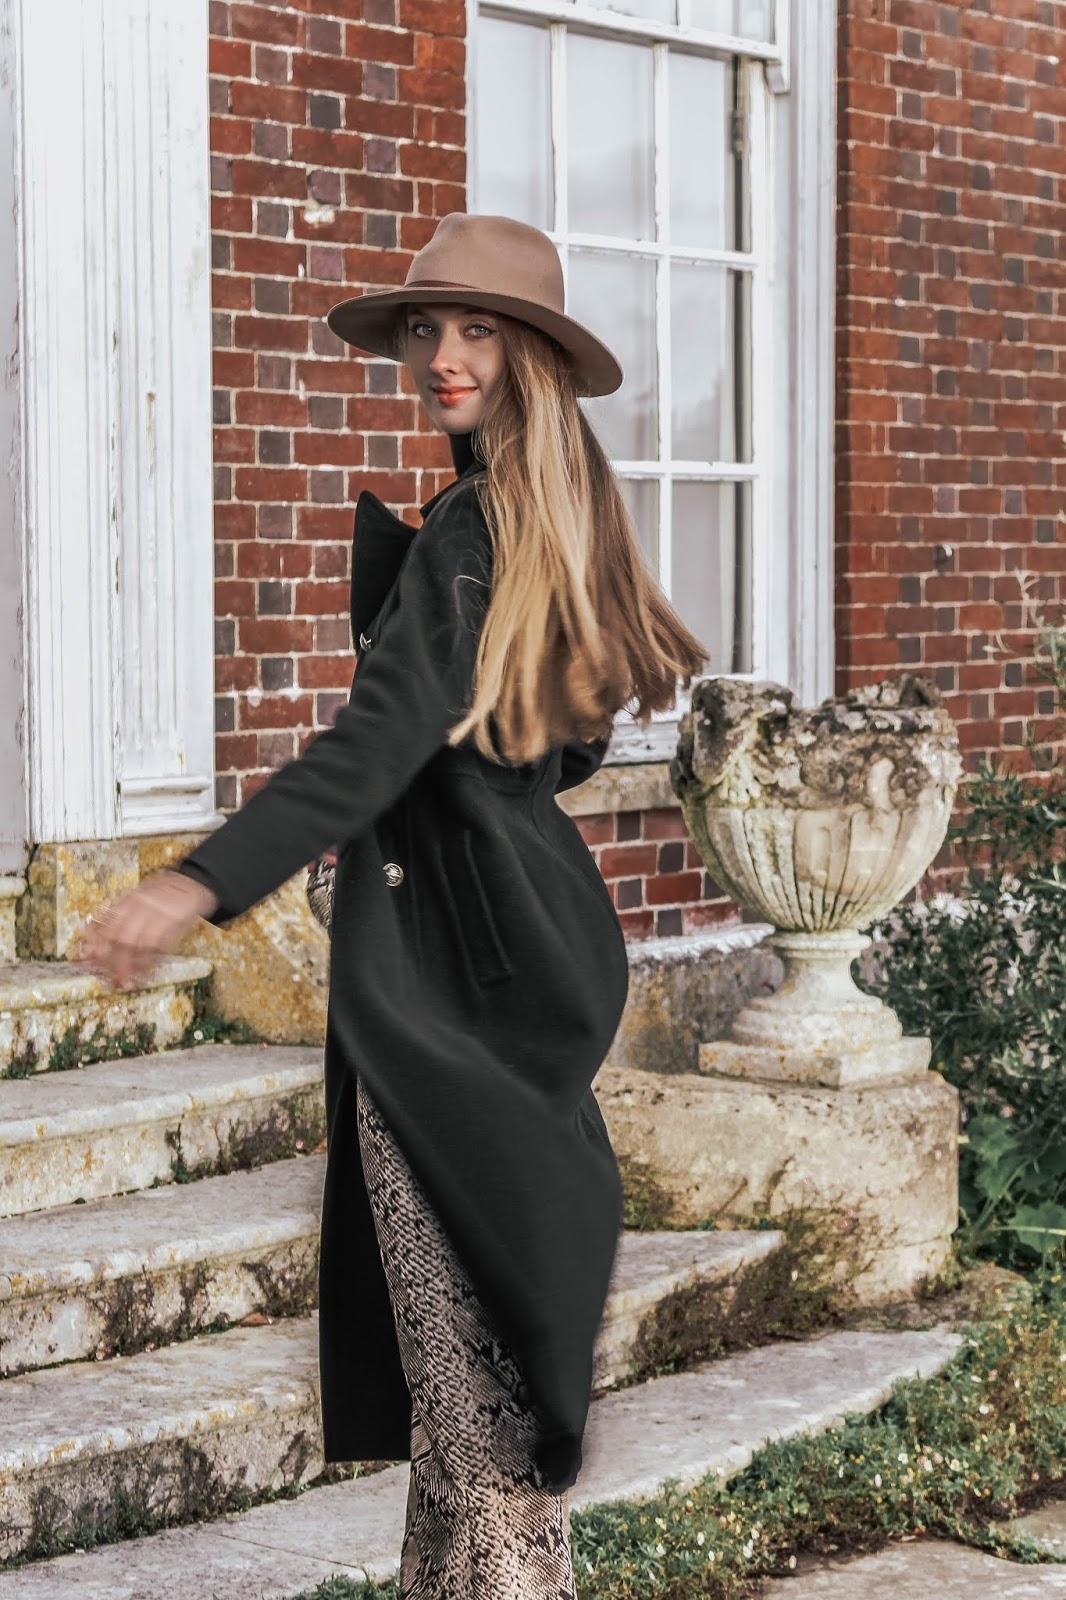 London Luxury Fashion Blog Styling Animal Print